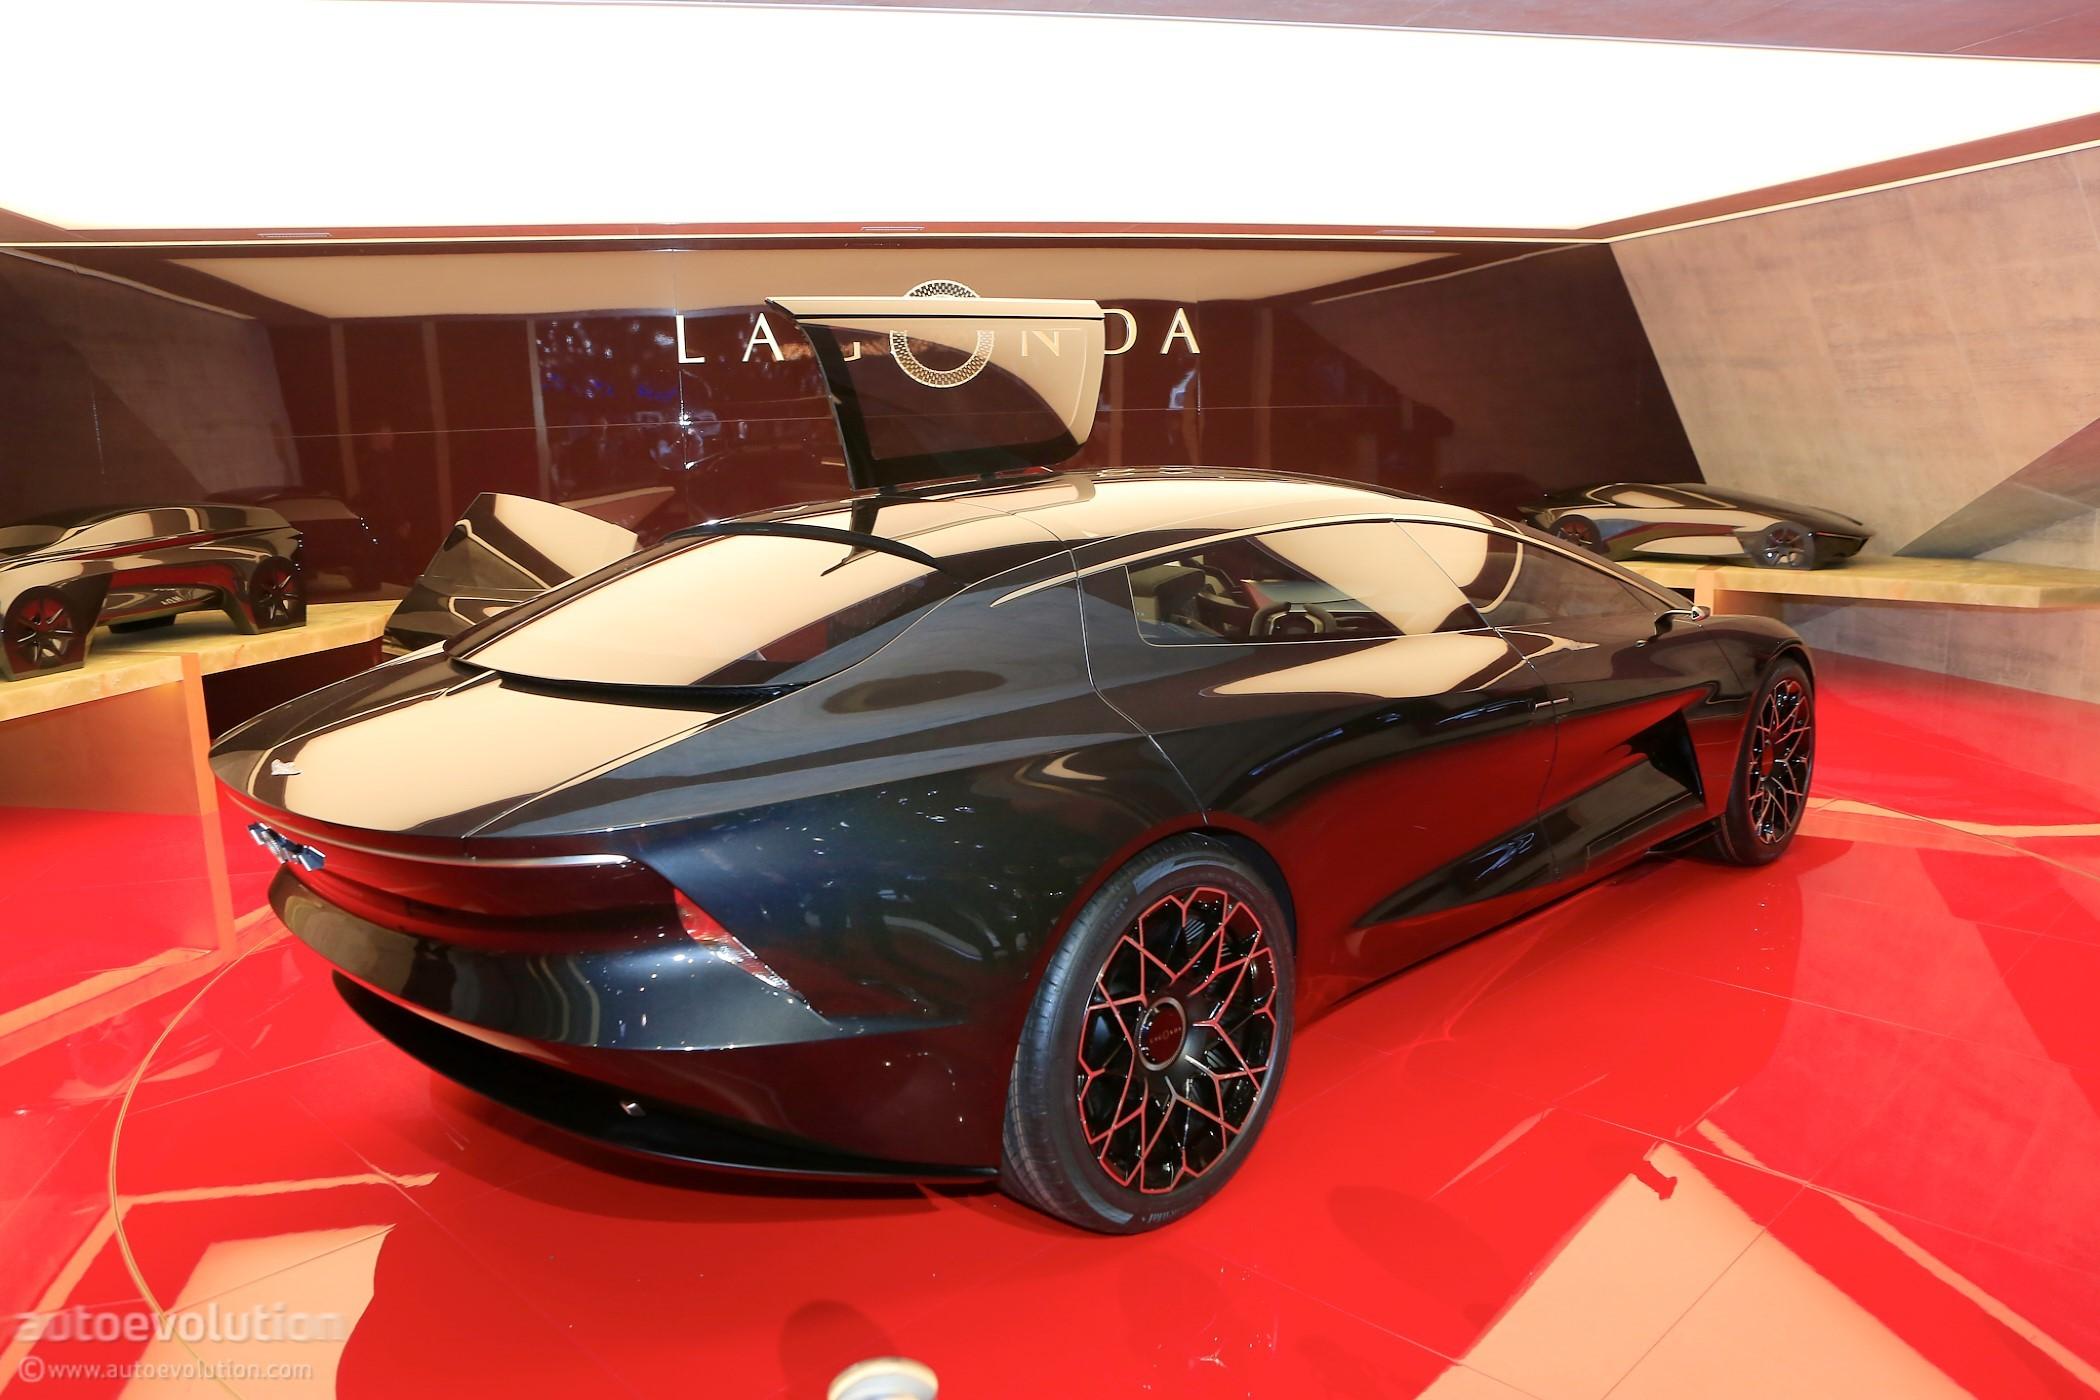 Lagonda Vision Concept Lands In Geneva To Wash The Sins Of